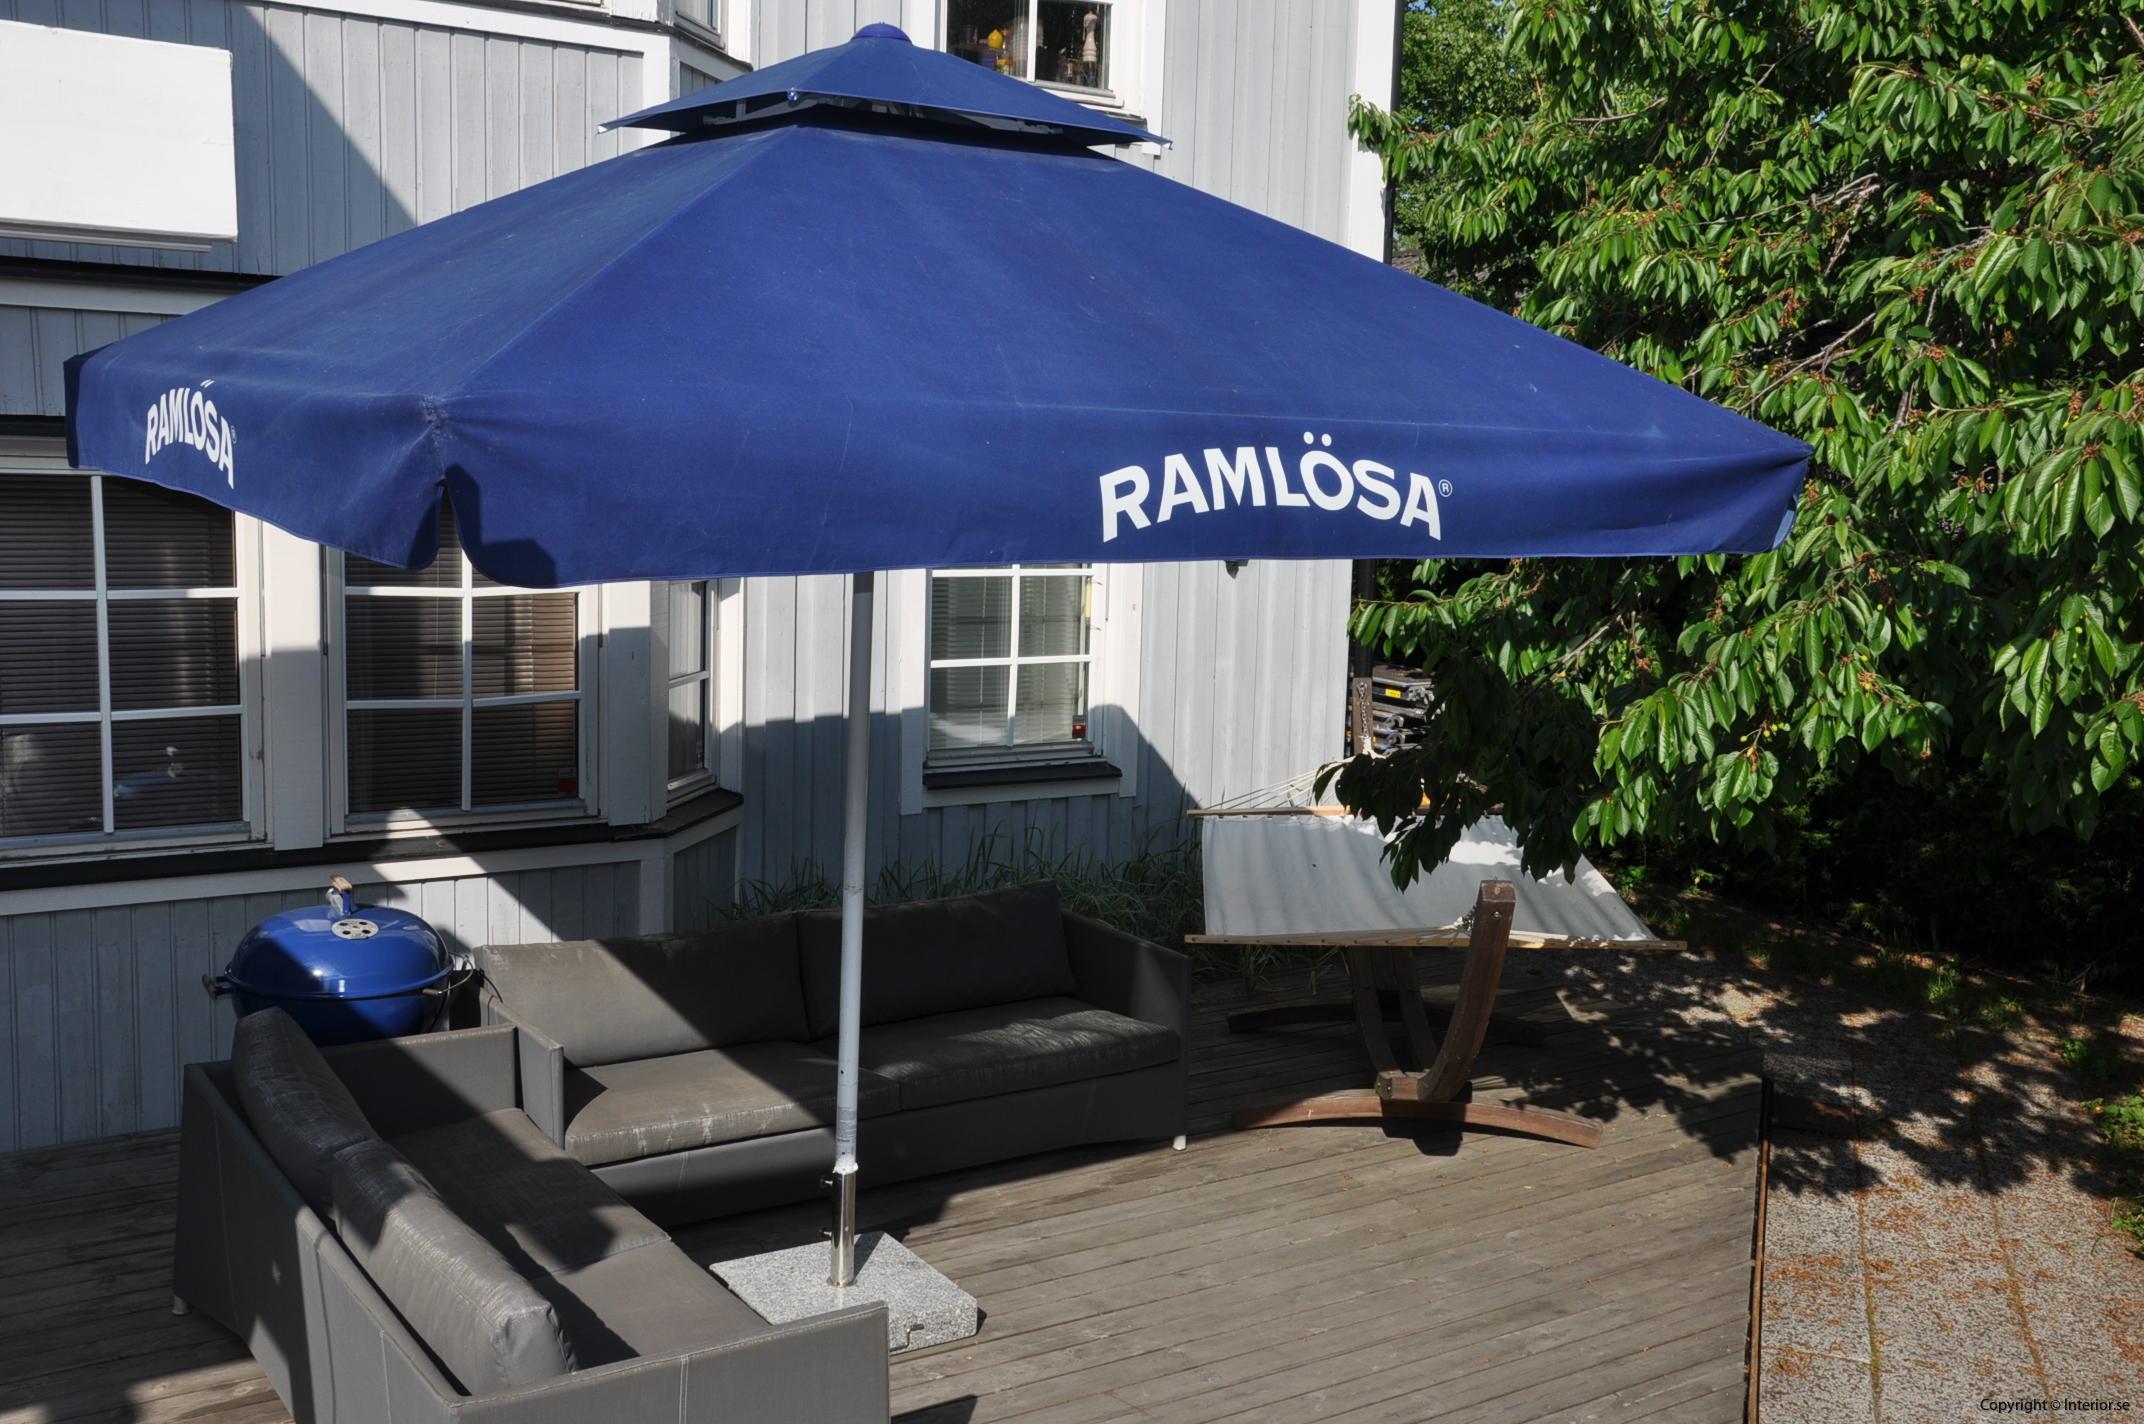 Hyr stora parasoll - 350 x 350 cm stockholm event (3)